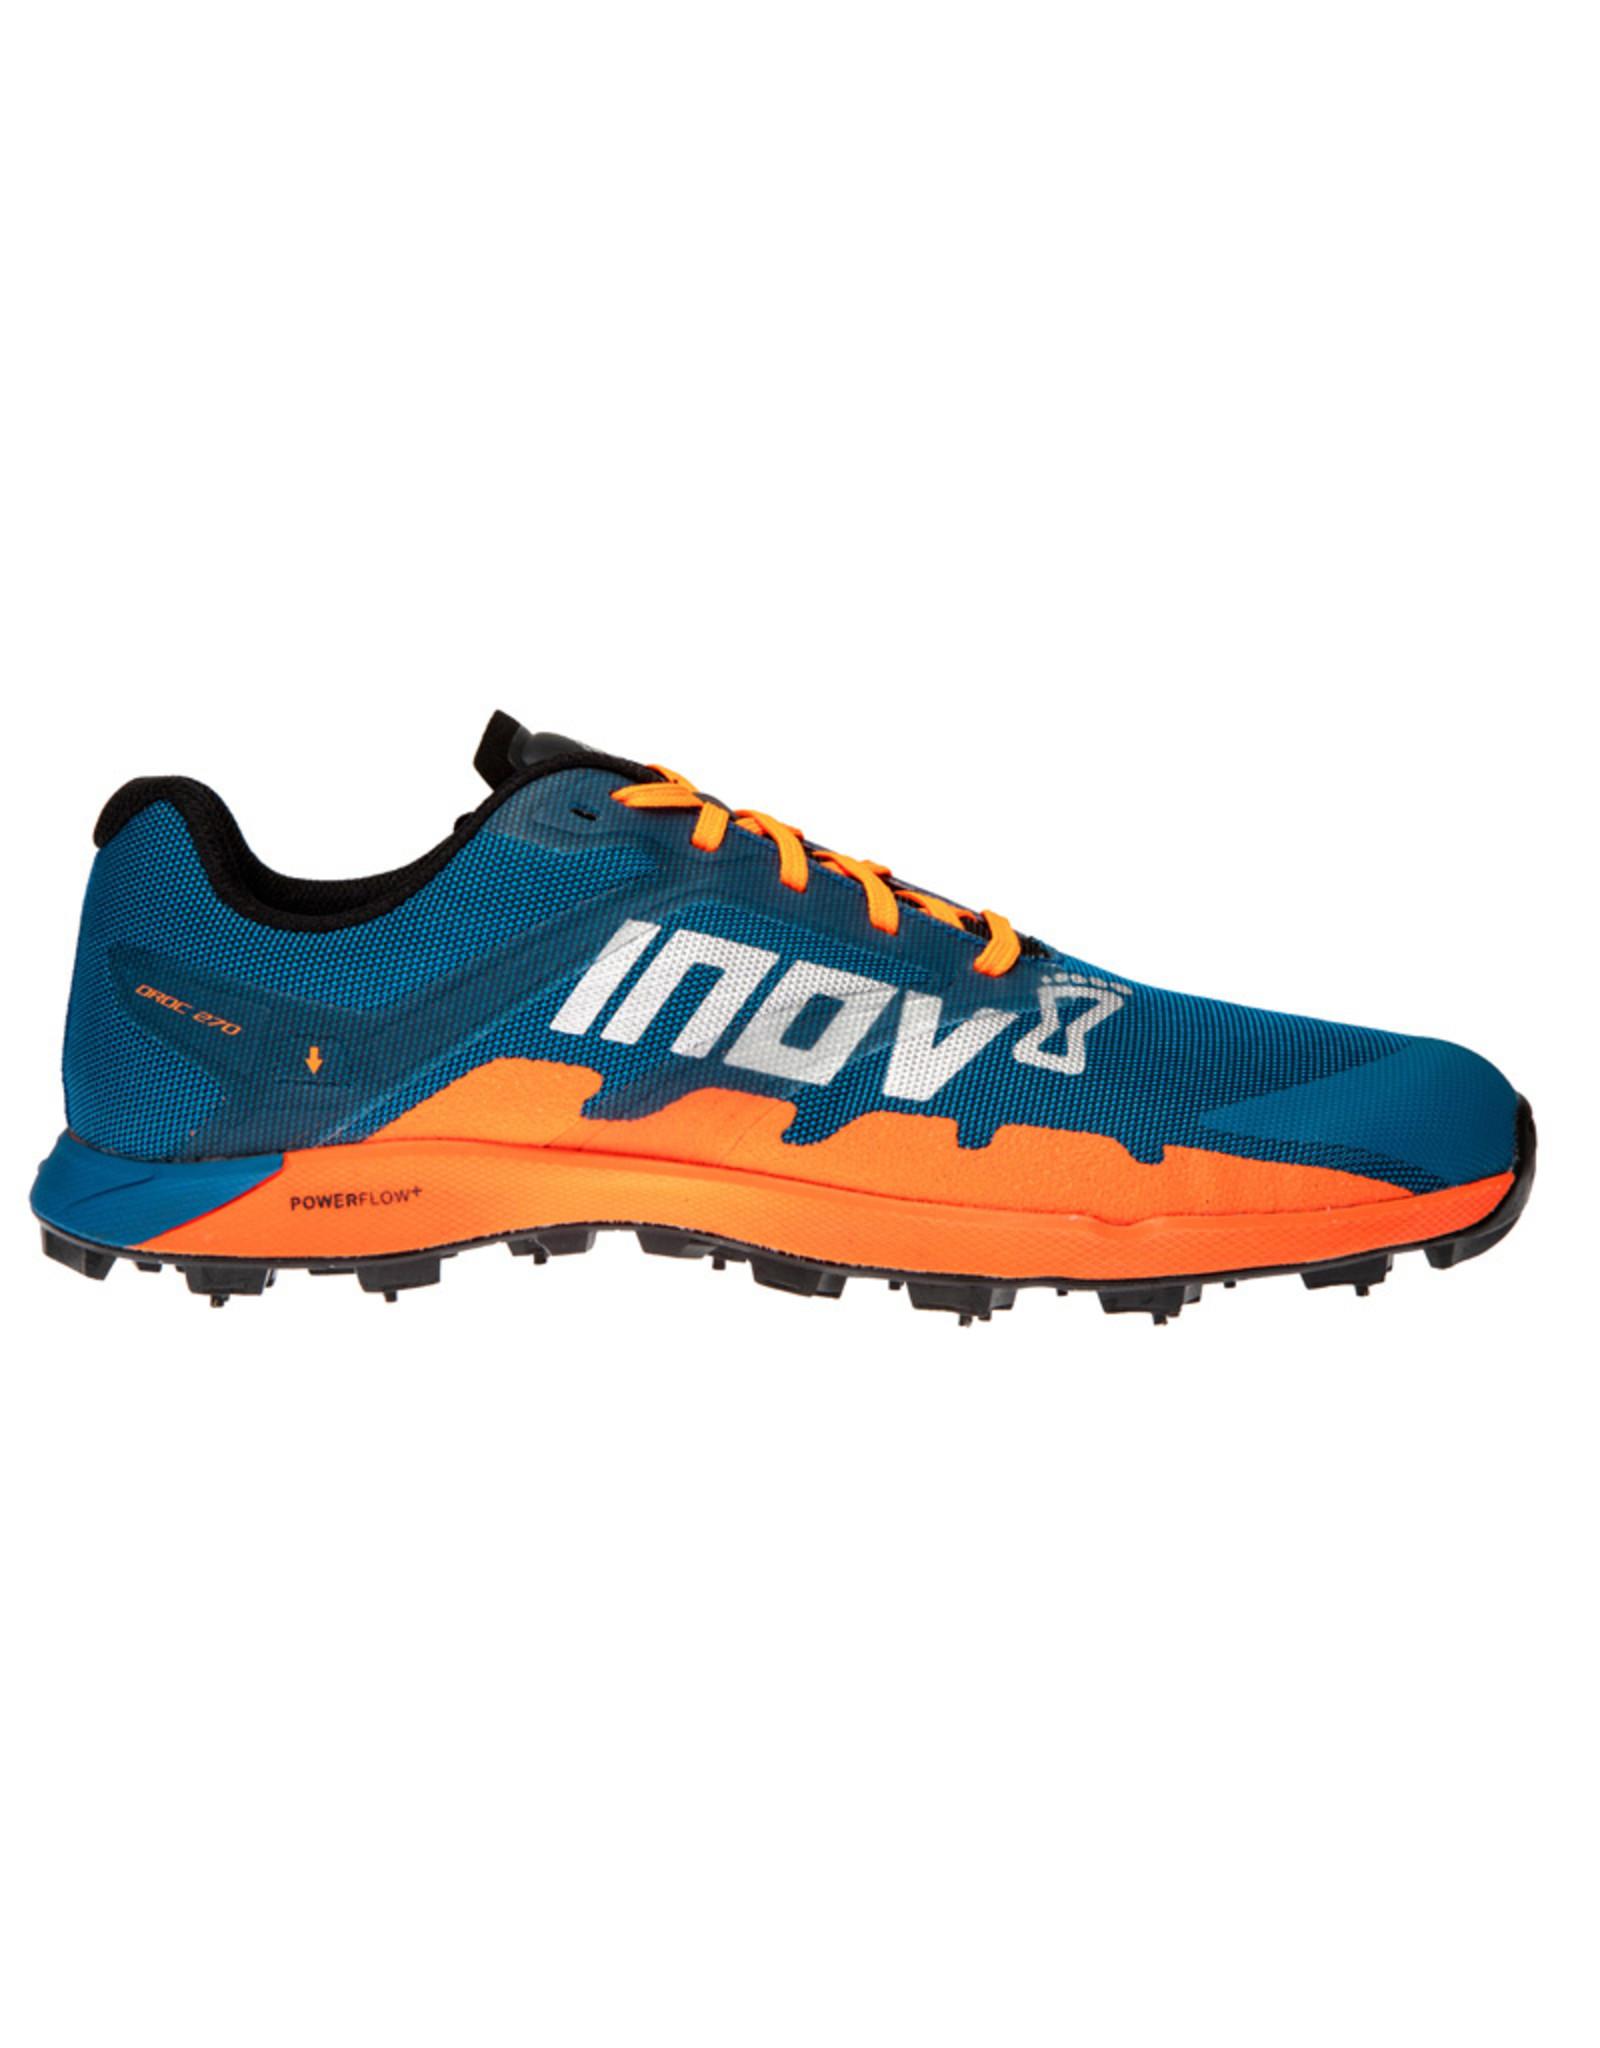 Inov-8 Oroc 270 Orientatielopen Schoen - Blauw/Oranje